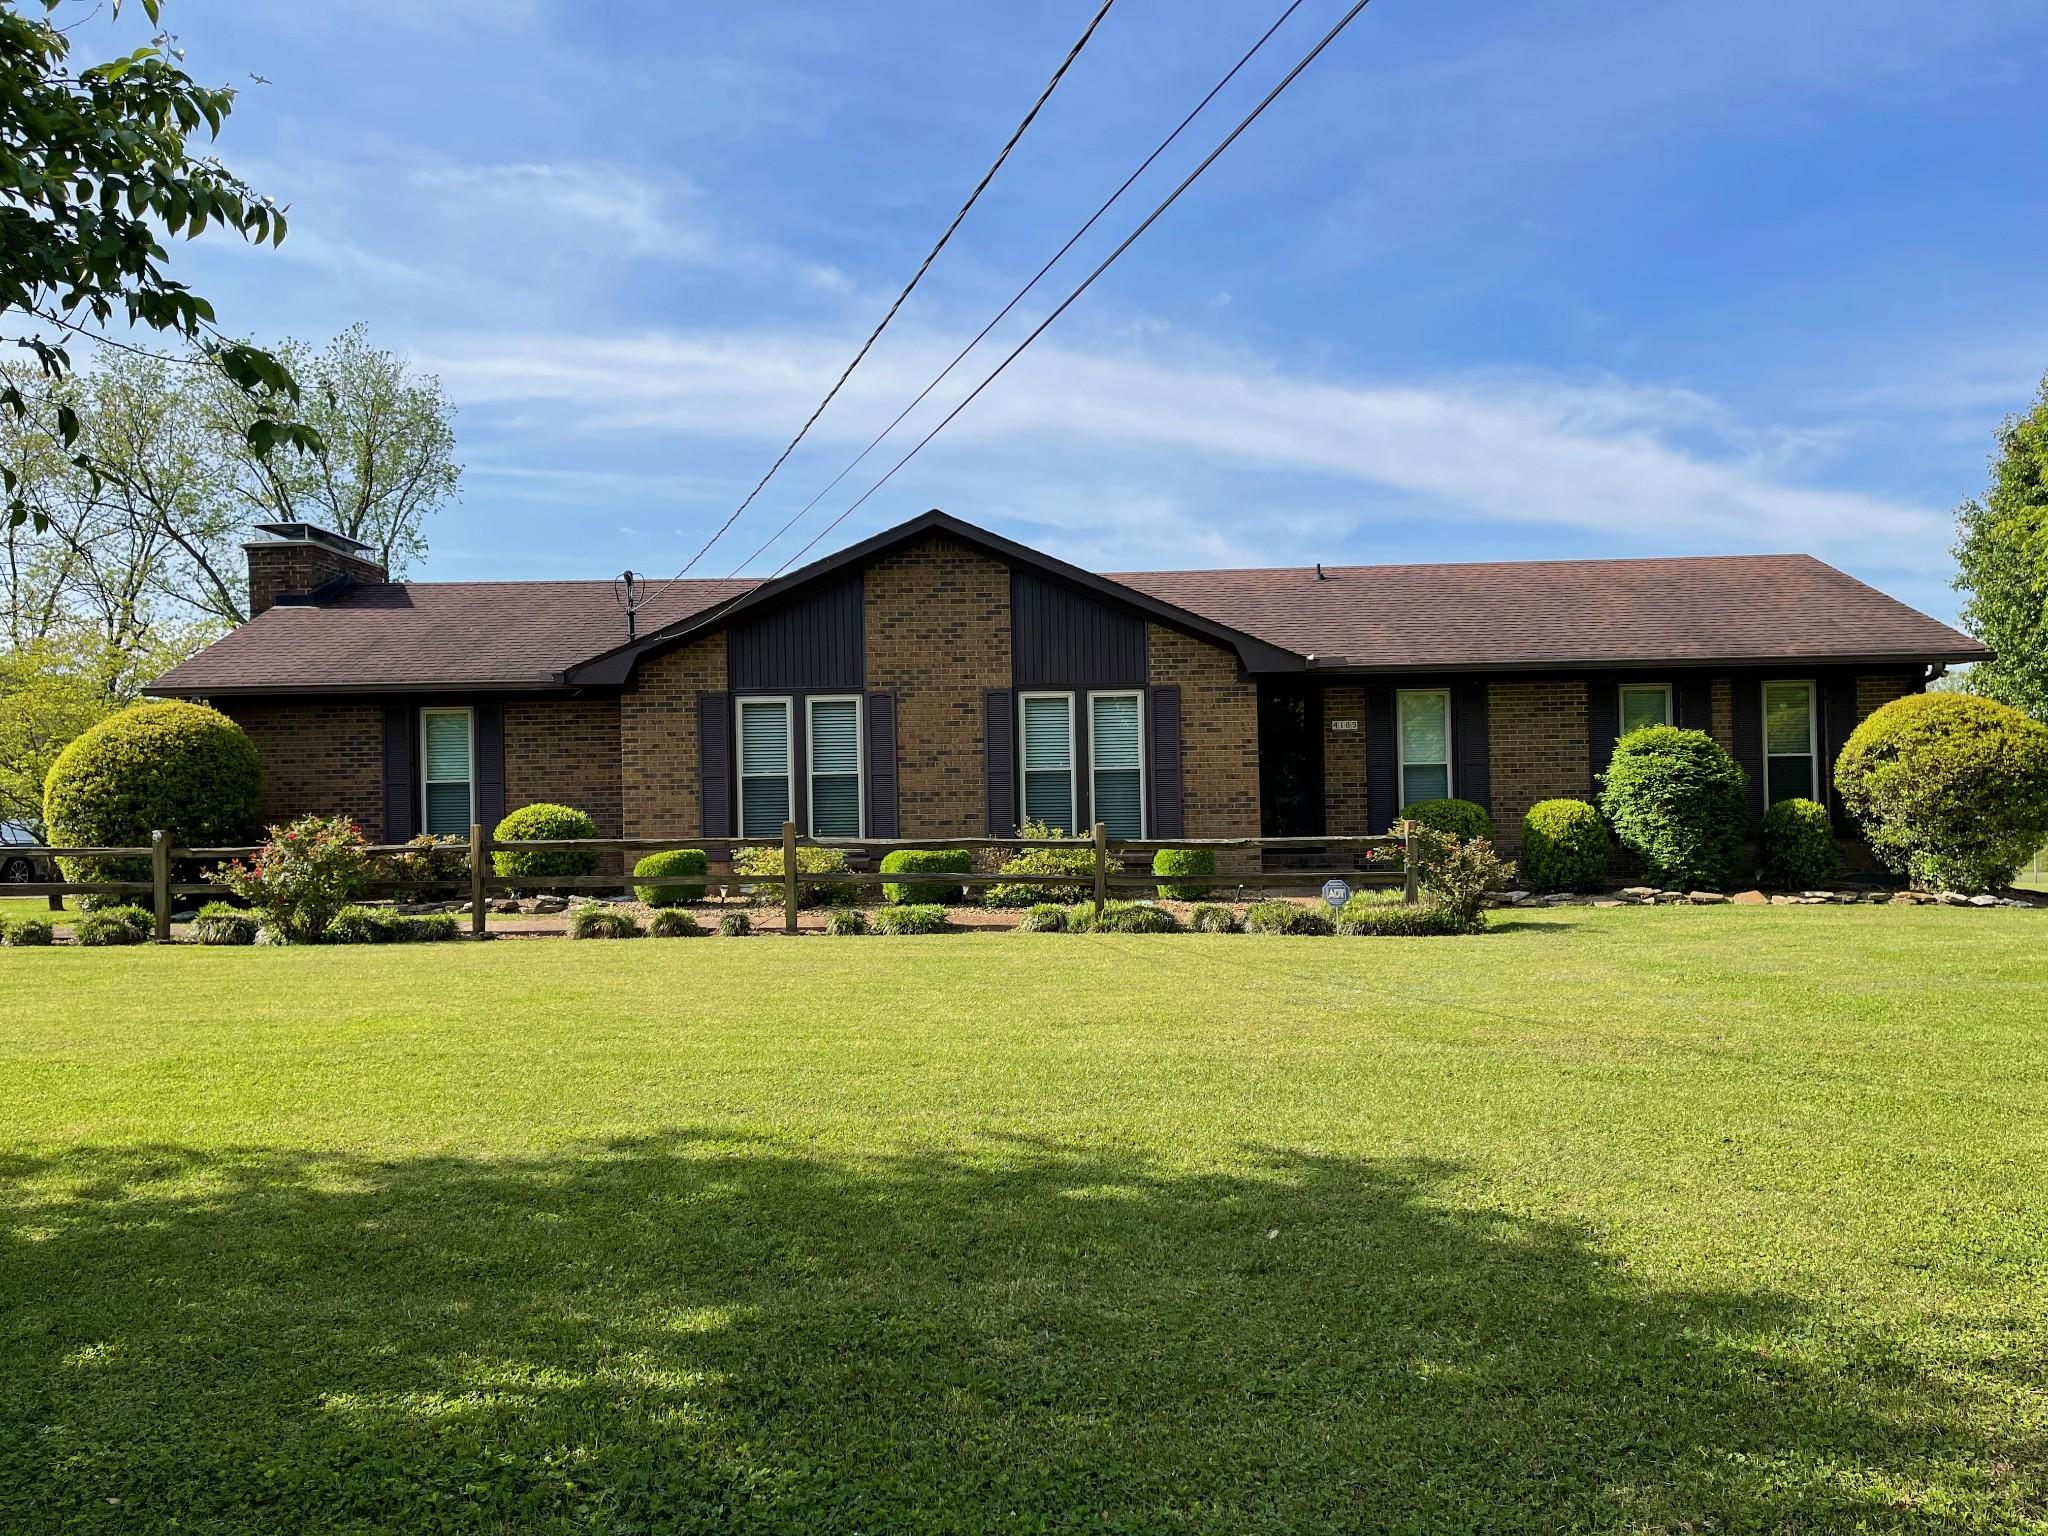 4189 Nonaville Rd N Property Photo - Mount Juliet, TN real estate listing